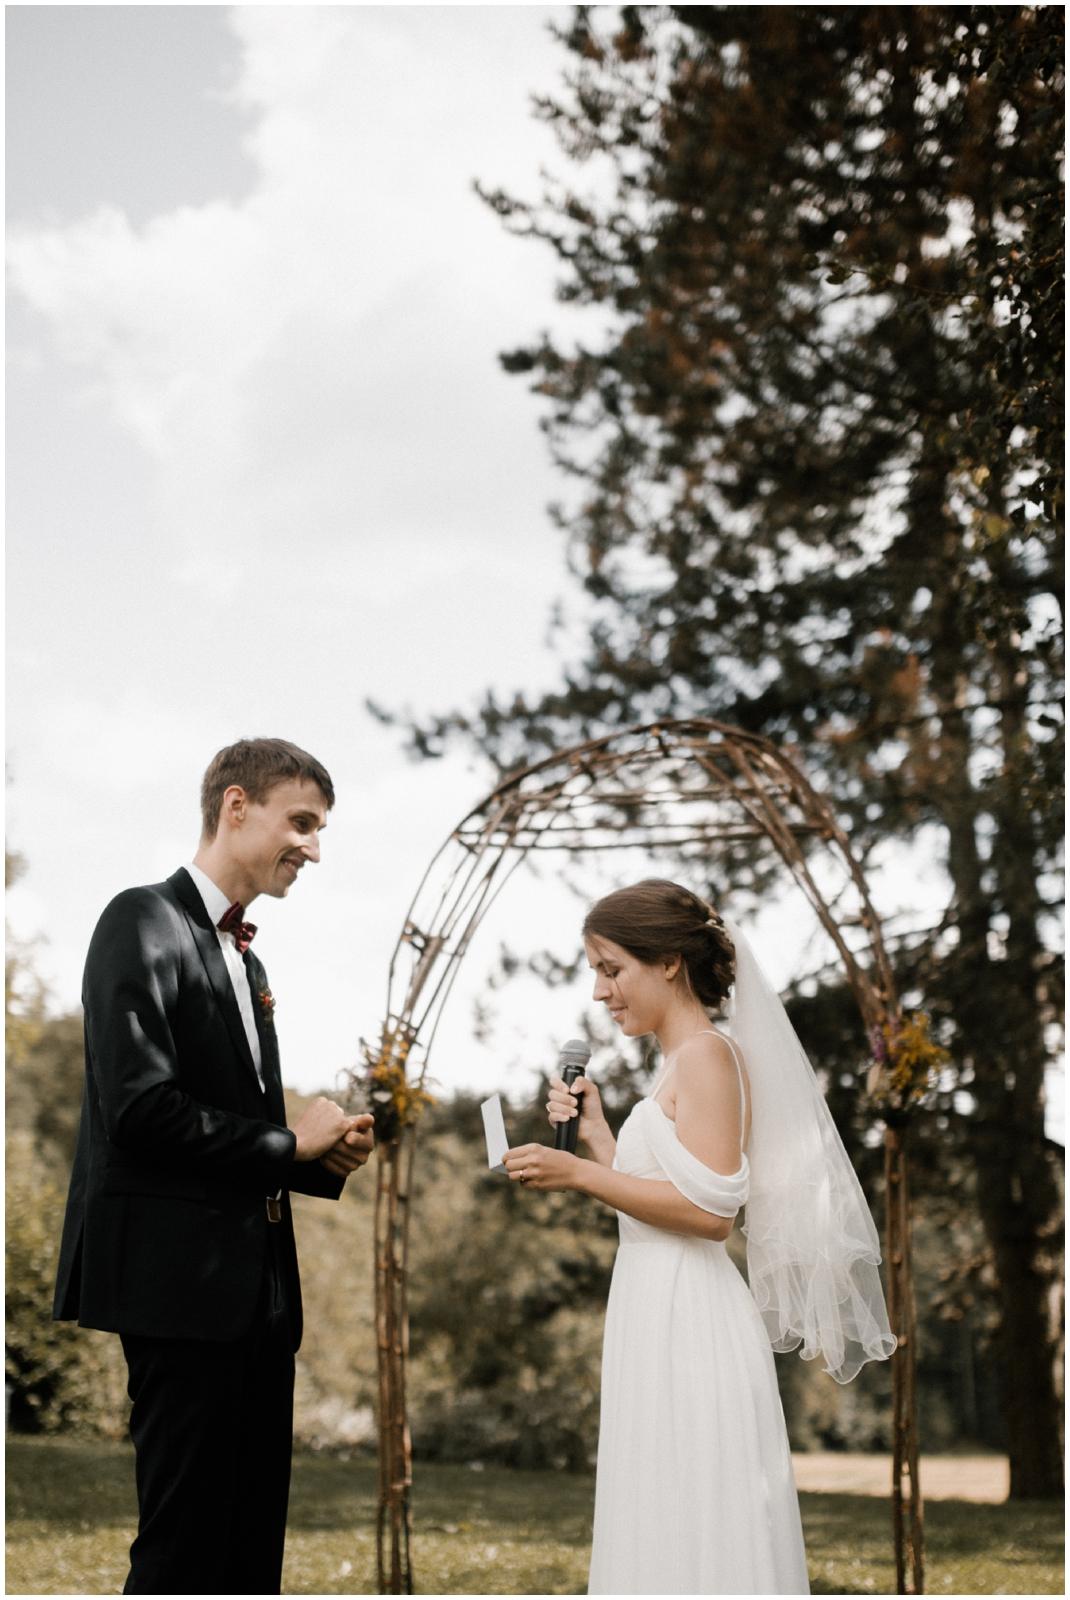 mirjam_thomas_wedding-398.jpg